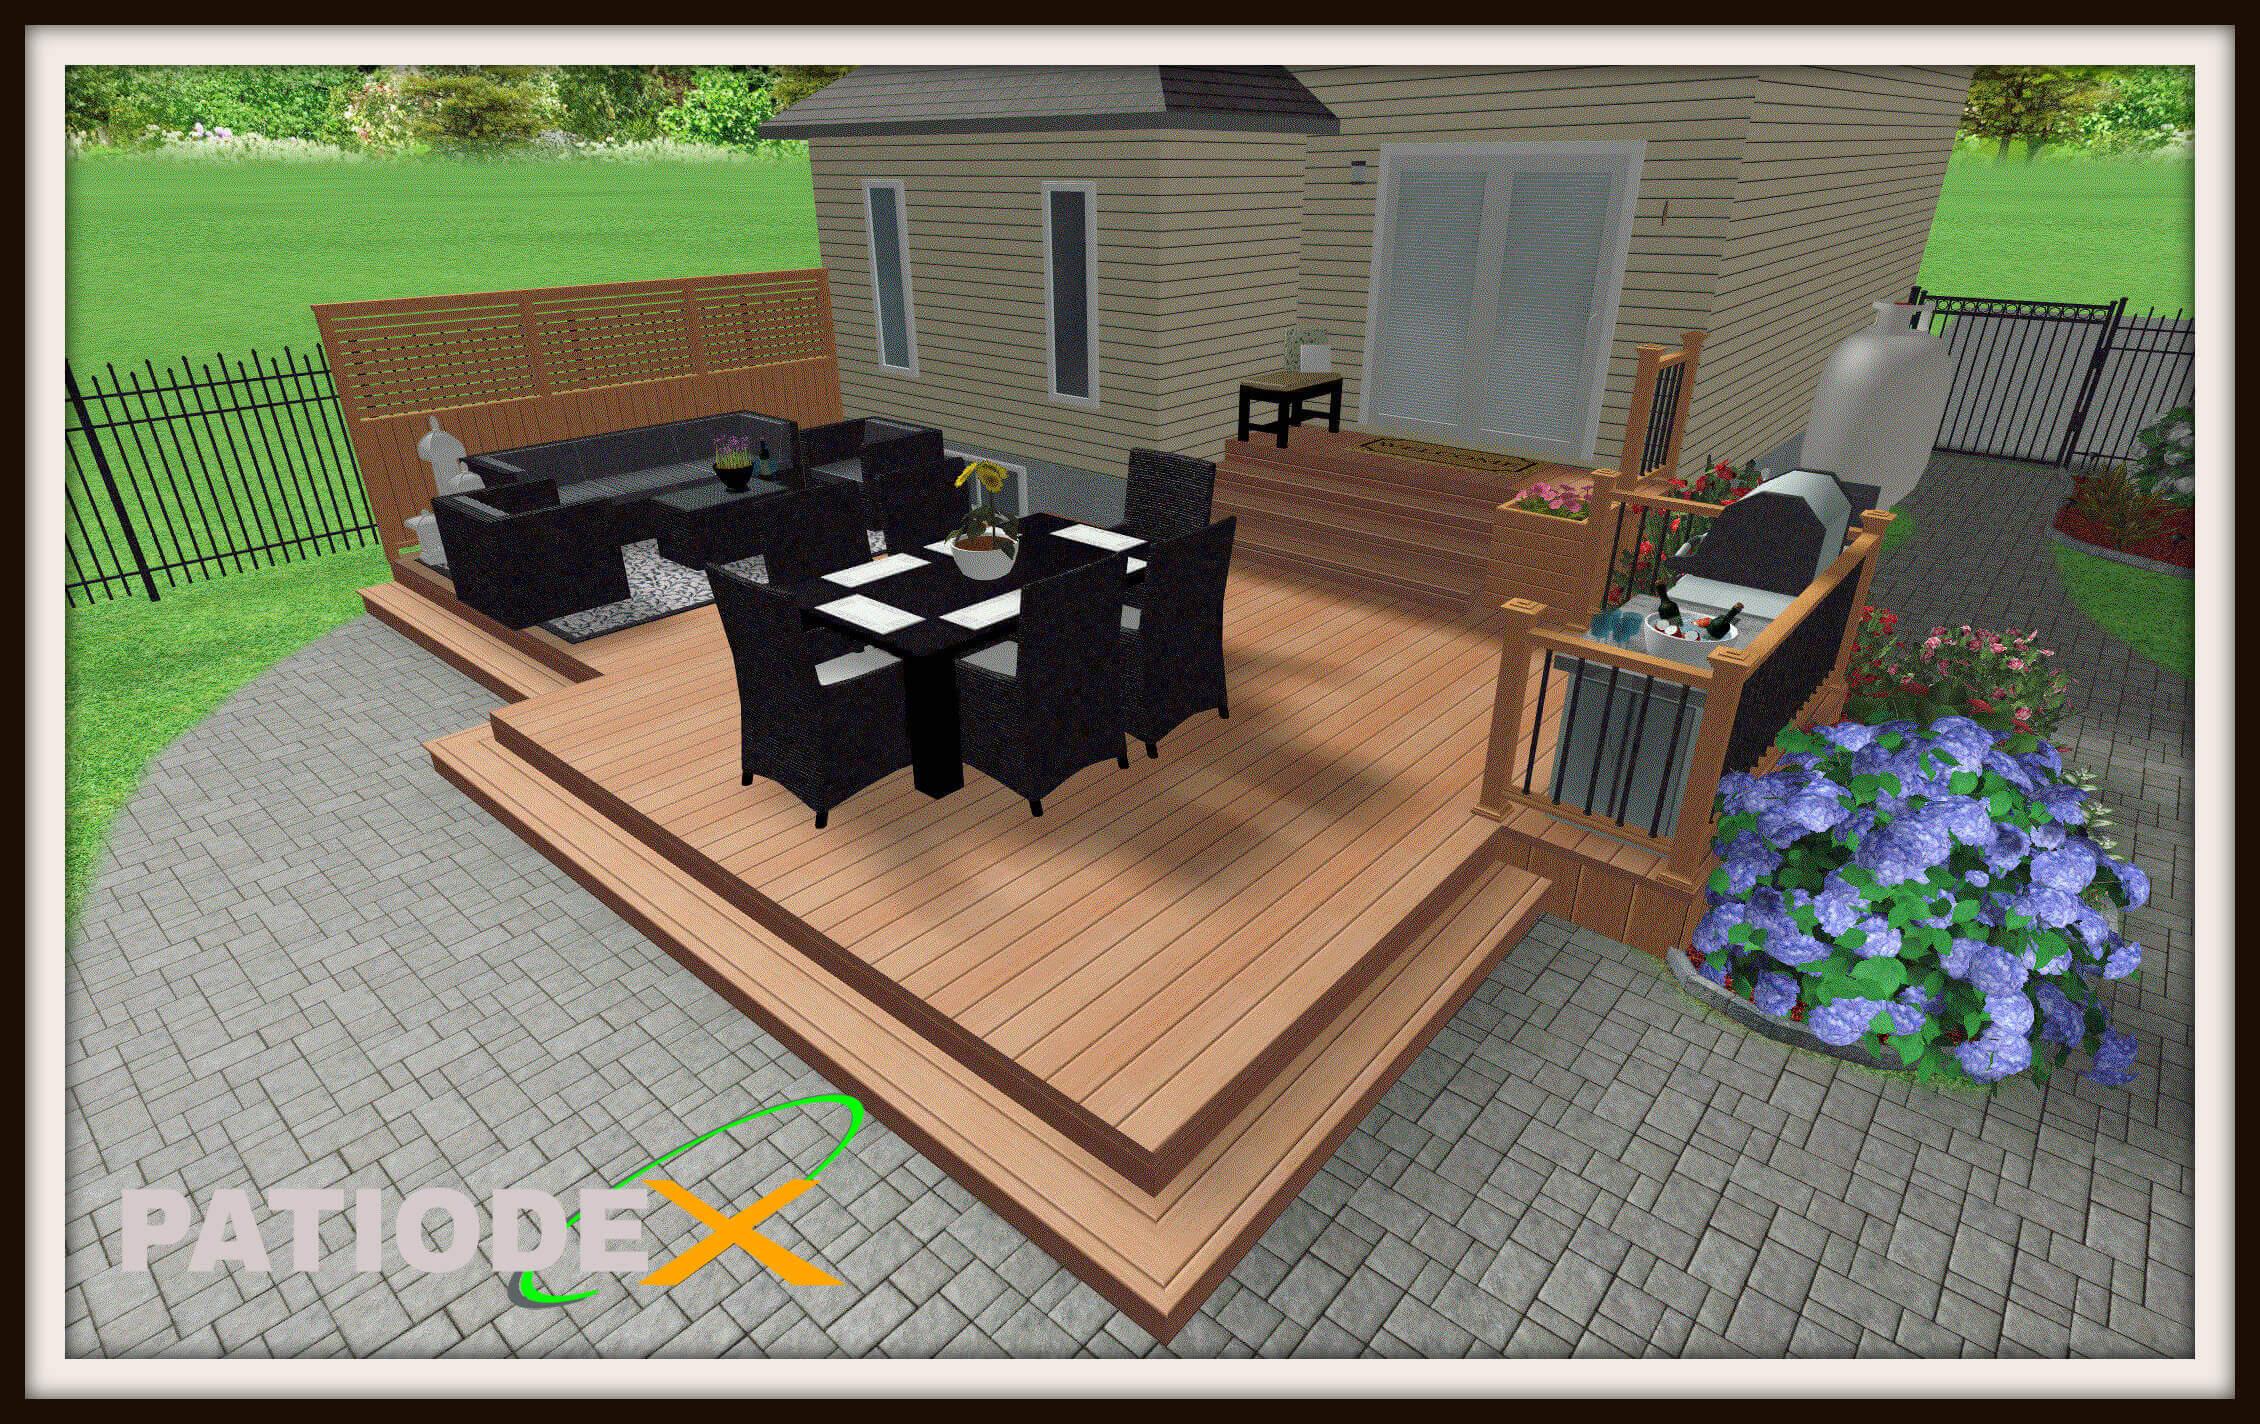 Patio En Bois Design Plan Modele Idee Piscine encequiconcerne Modele De Terrasse